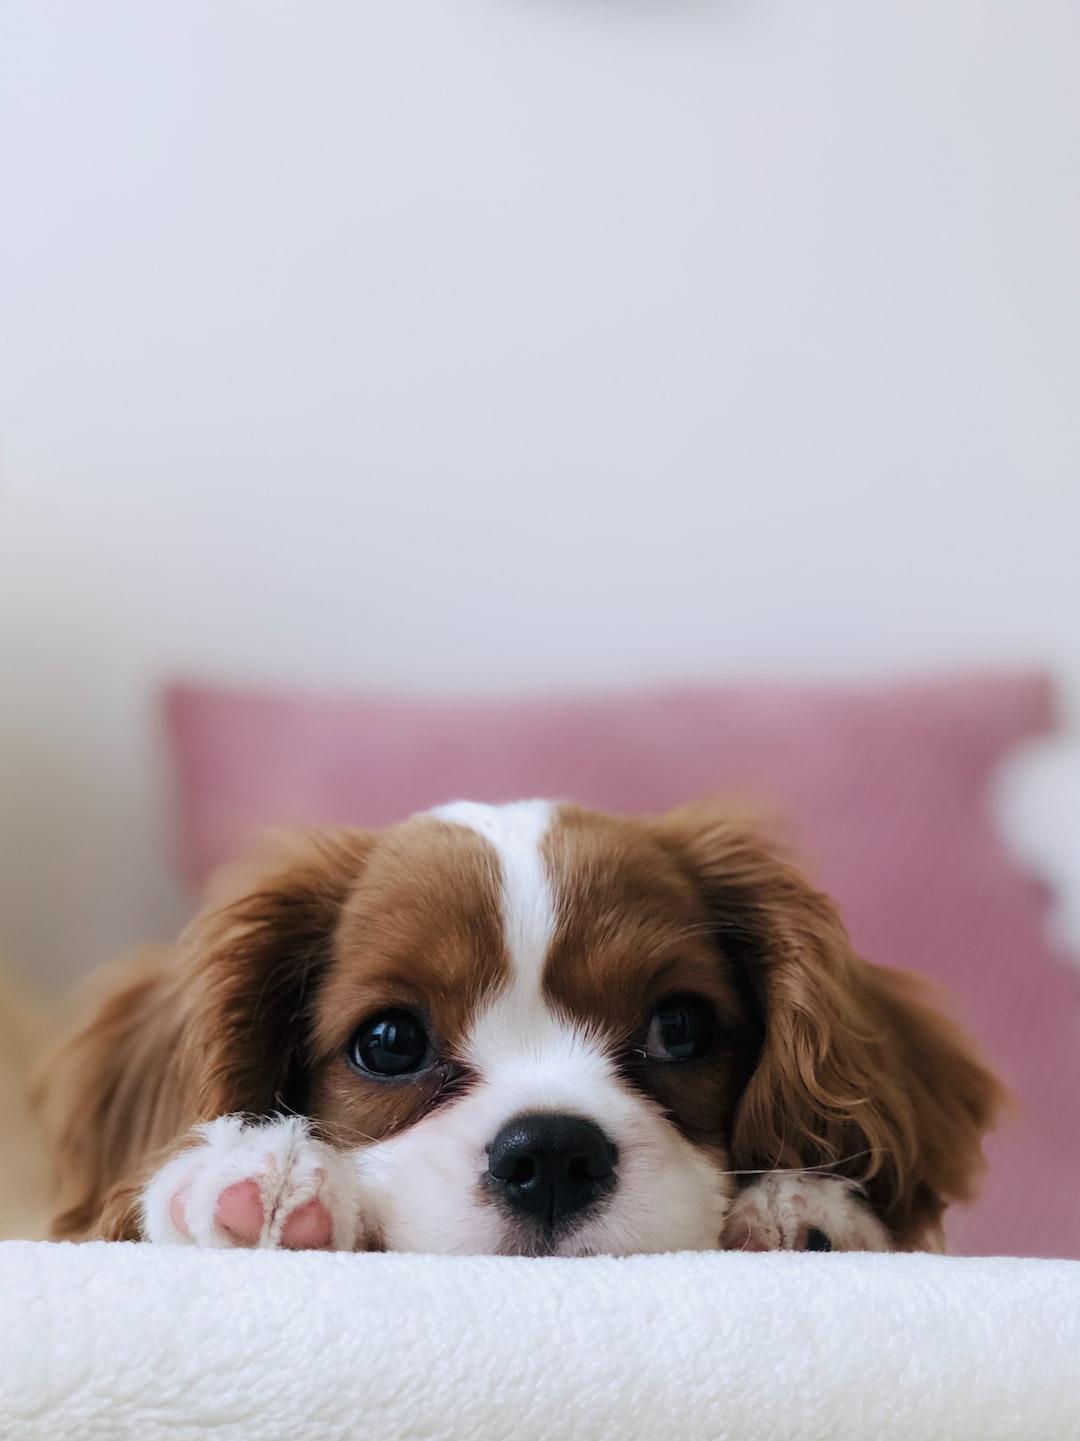 Pinterest Holiday Desktop Wallpapers On Wallpaperdog Puppy Wallpapers Free Hd Download 500 Hq Unsplash